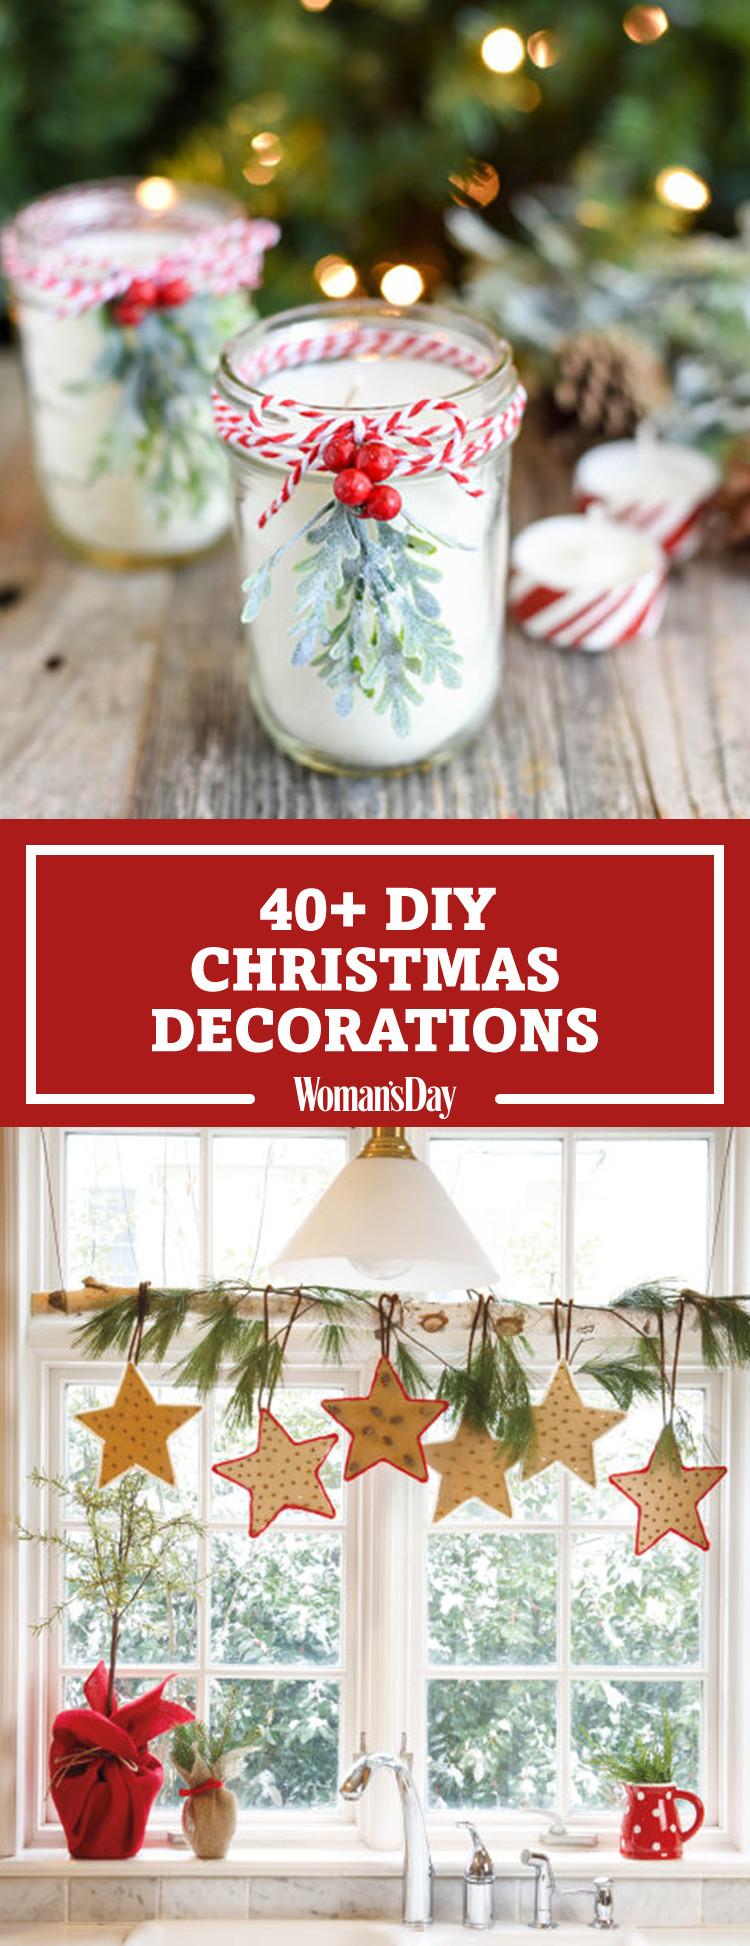 Diy Christmas Decoration  47 Easy DIY Christmas Decorations Homemade Ideas for